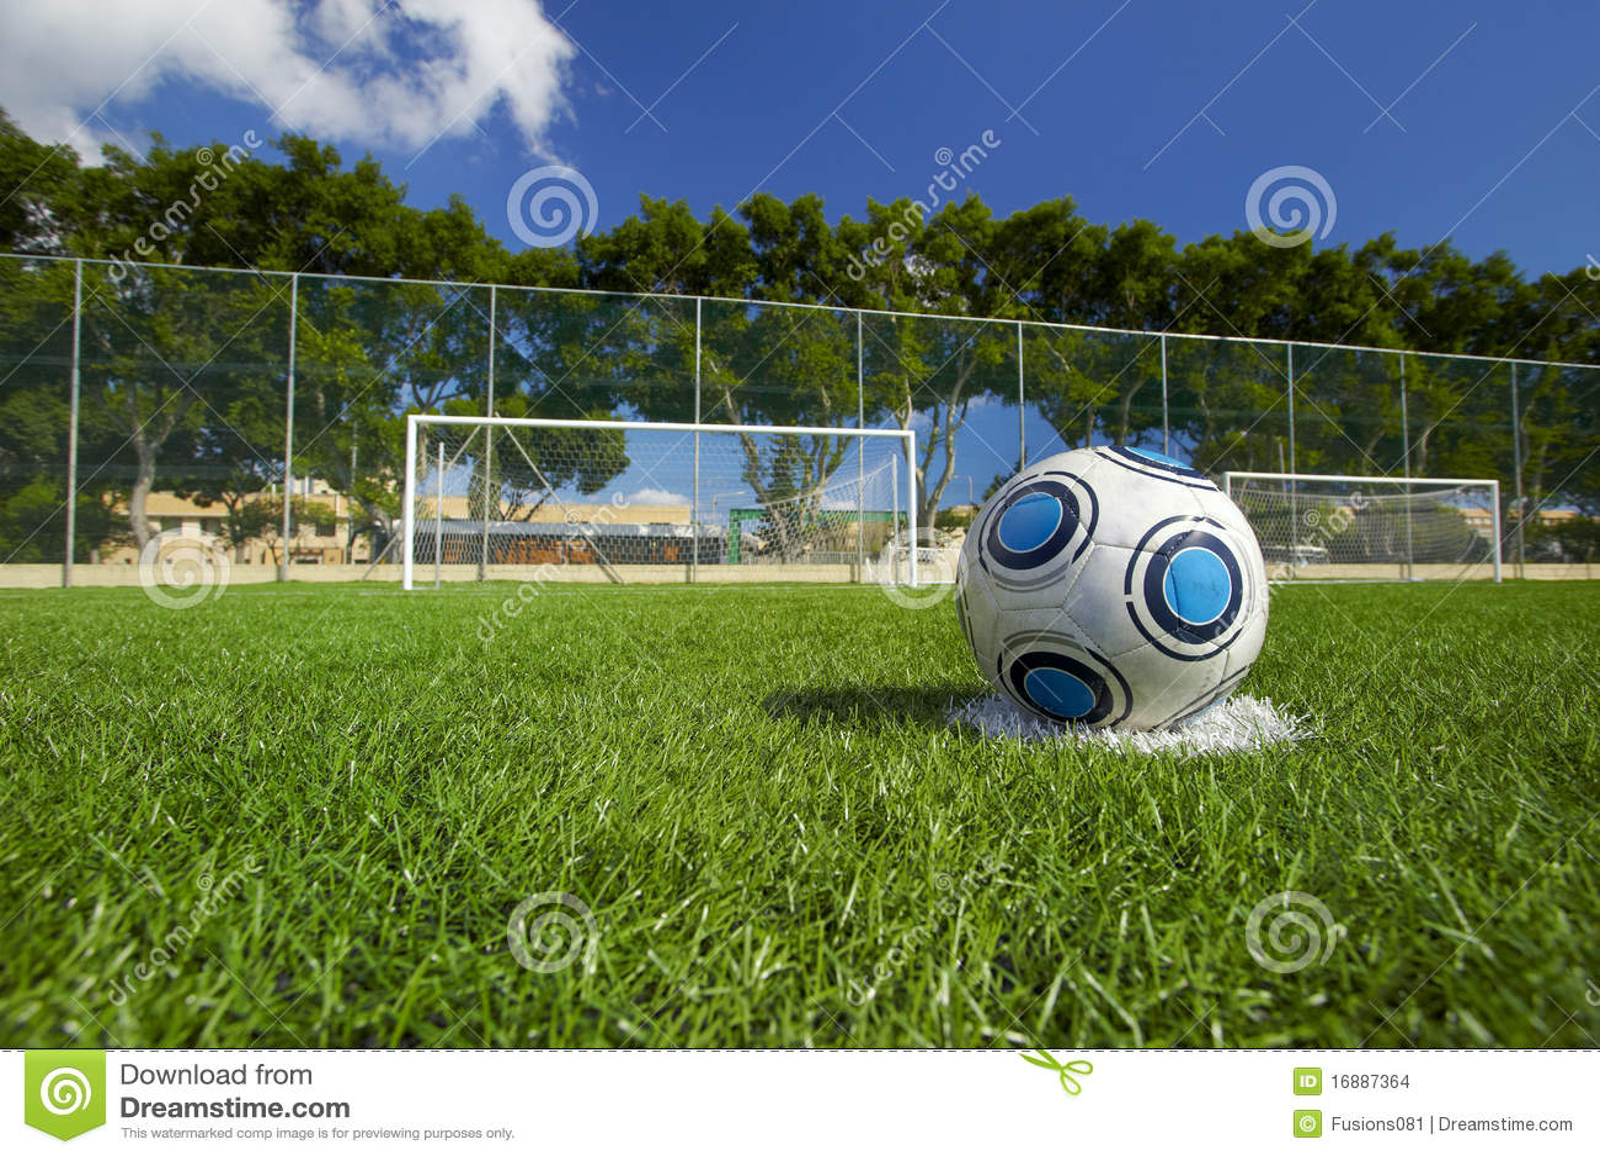 Soccer Ball On Football Field Stock Photo - Image: 16887364